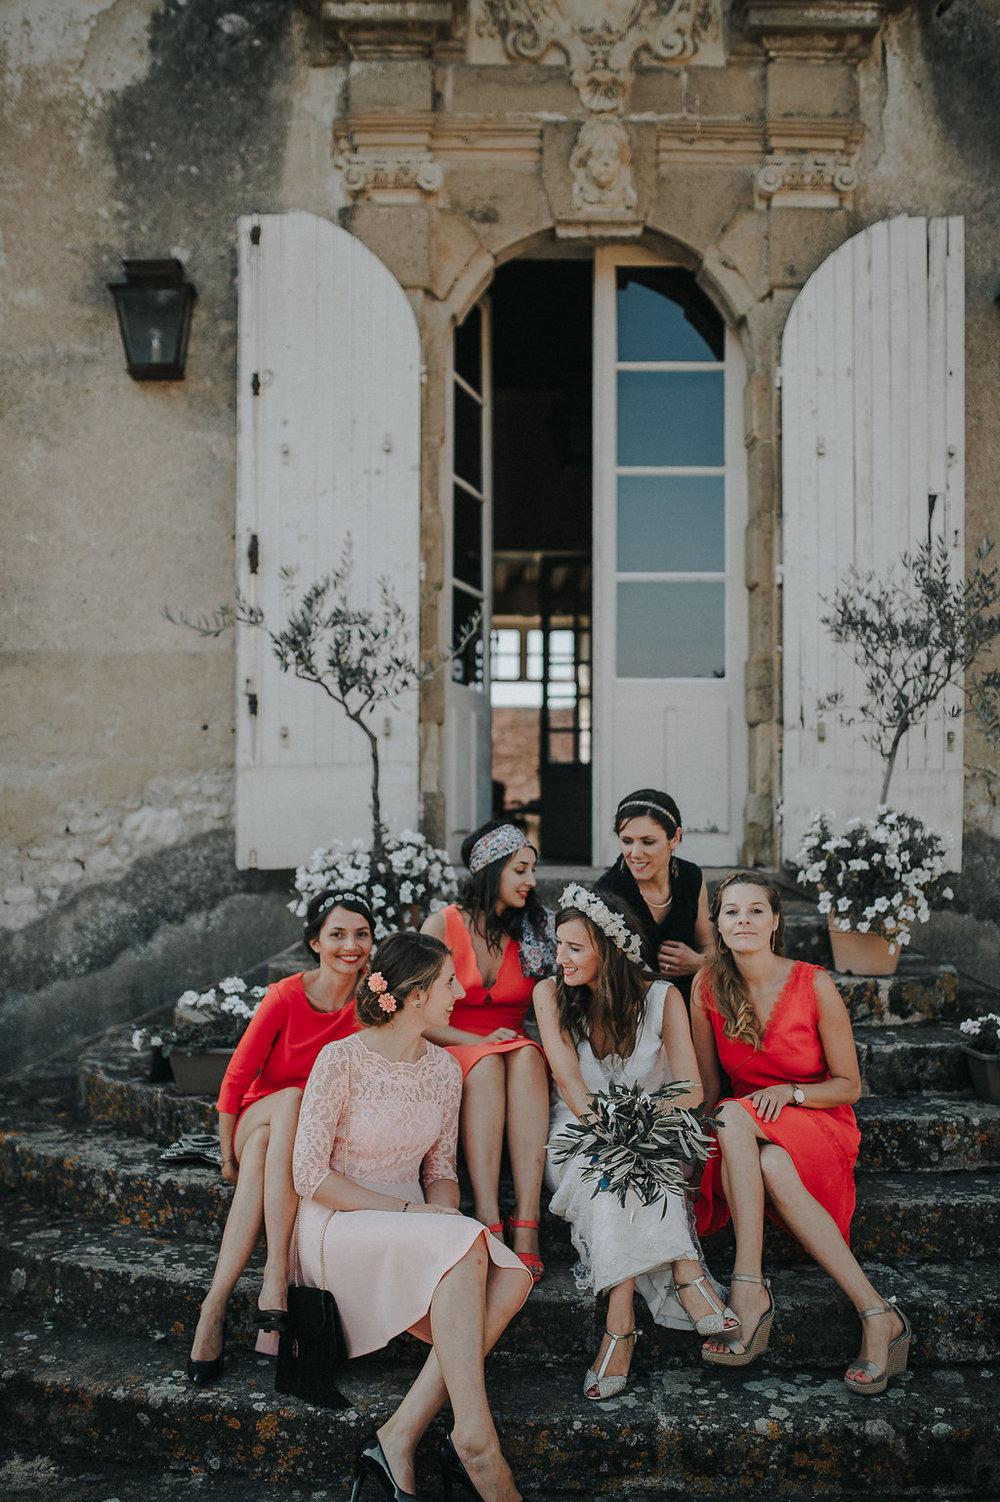 photographe_mariage_bohemechic (9).jpg